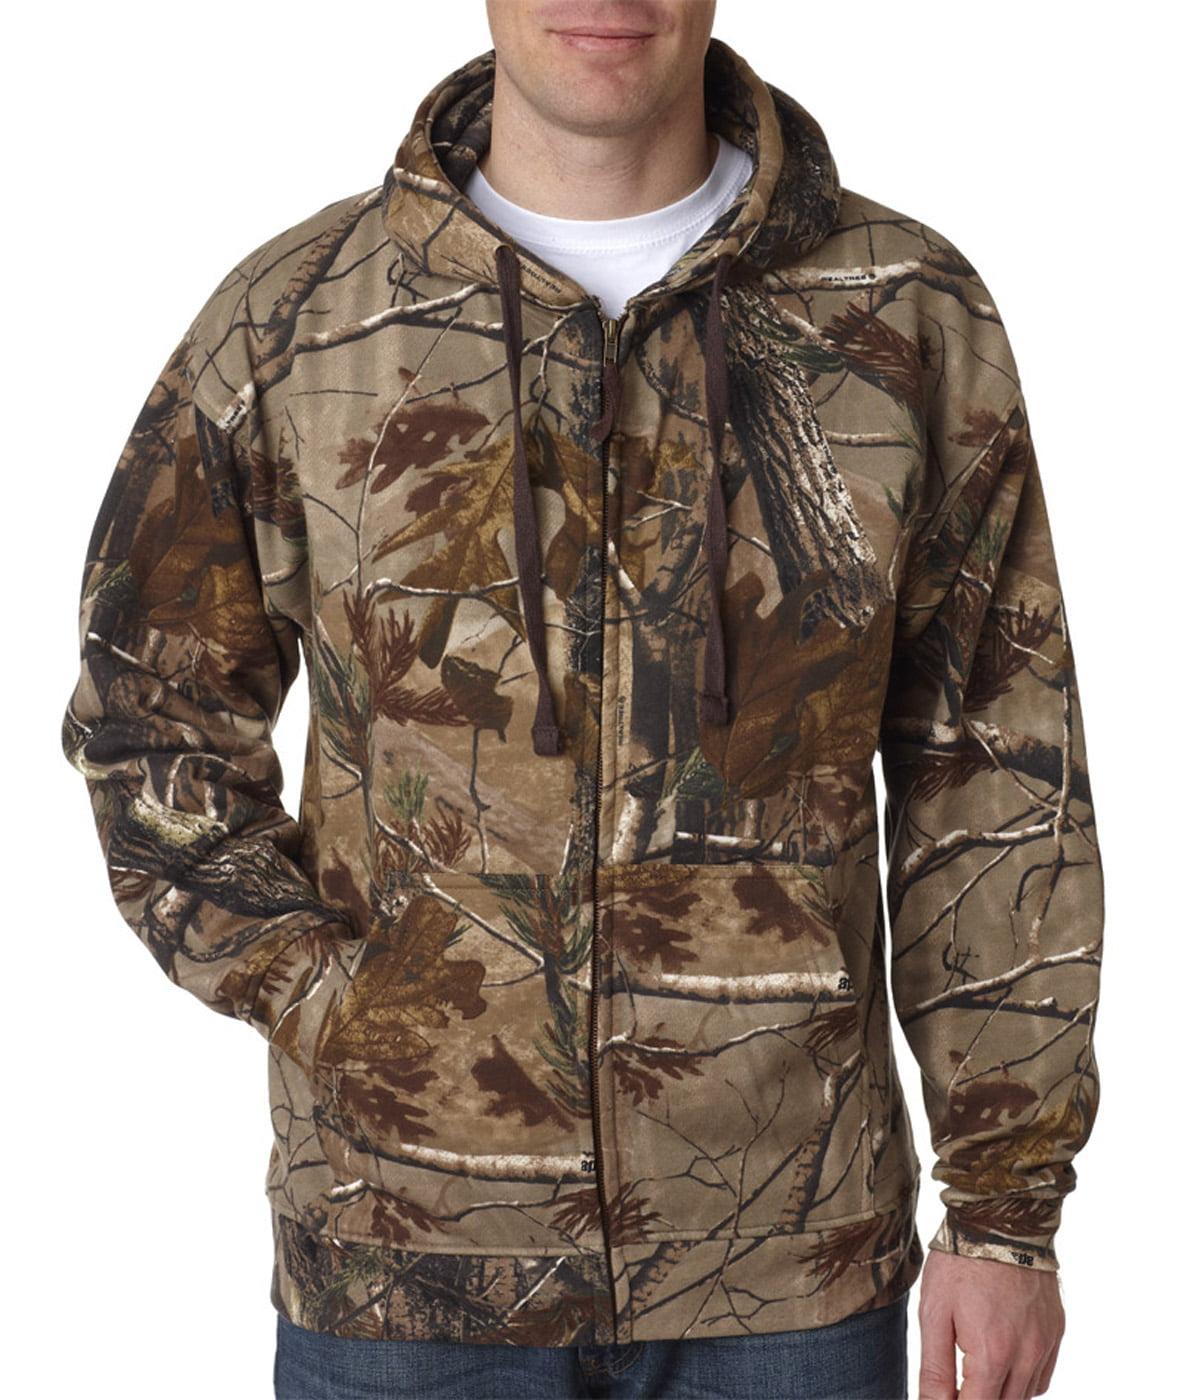 Click here to buy Code Five Adult REALTREE Camo Zip Fleece Hoodie AP 3XL 3989 by Code V.